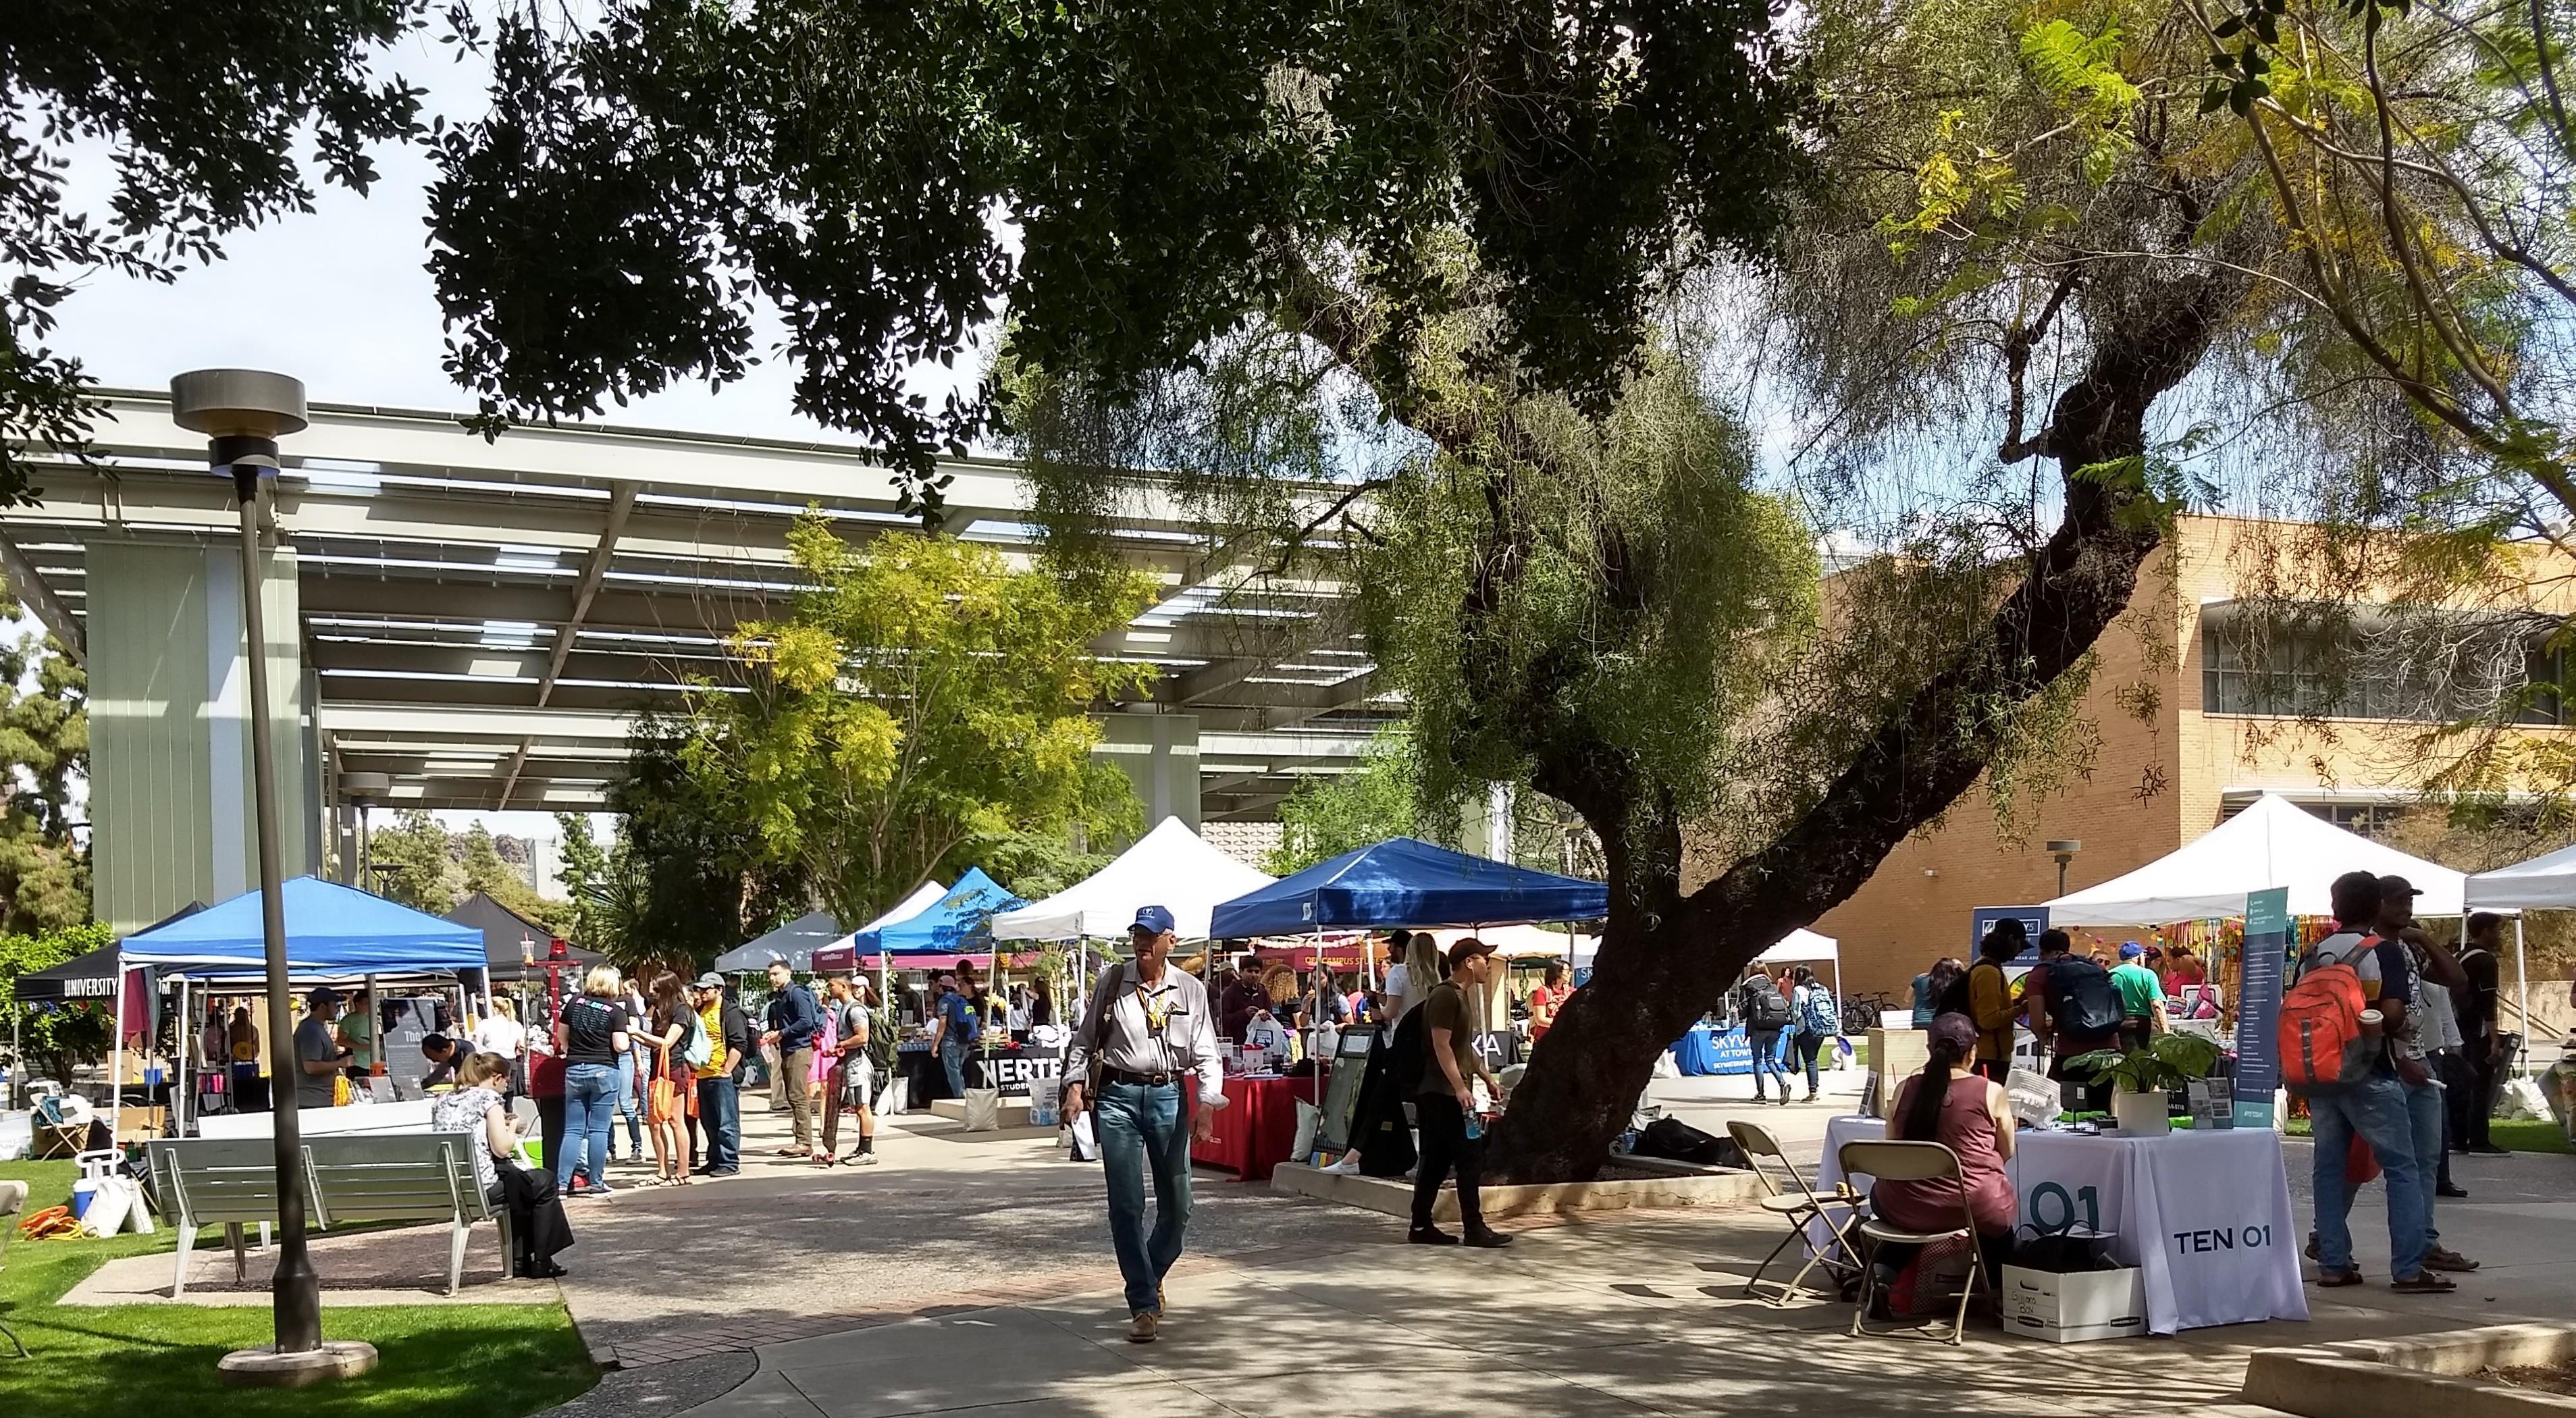 ASU Off Campus Housing Fair Tempe 2019